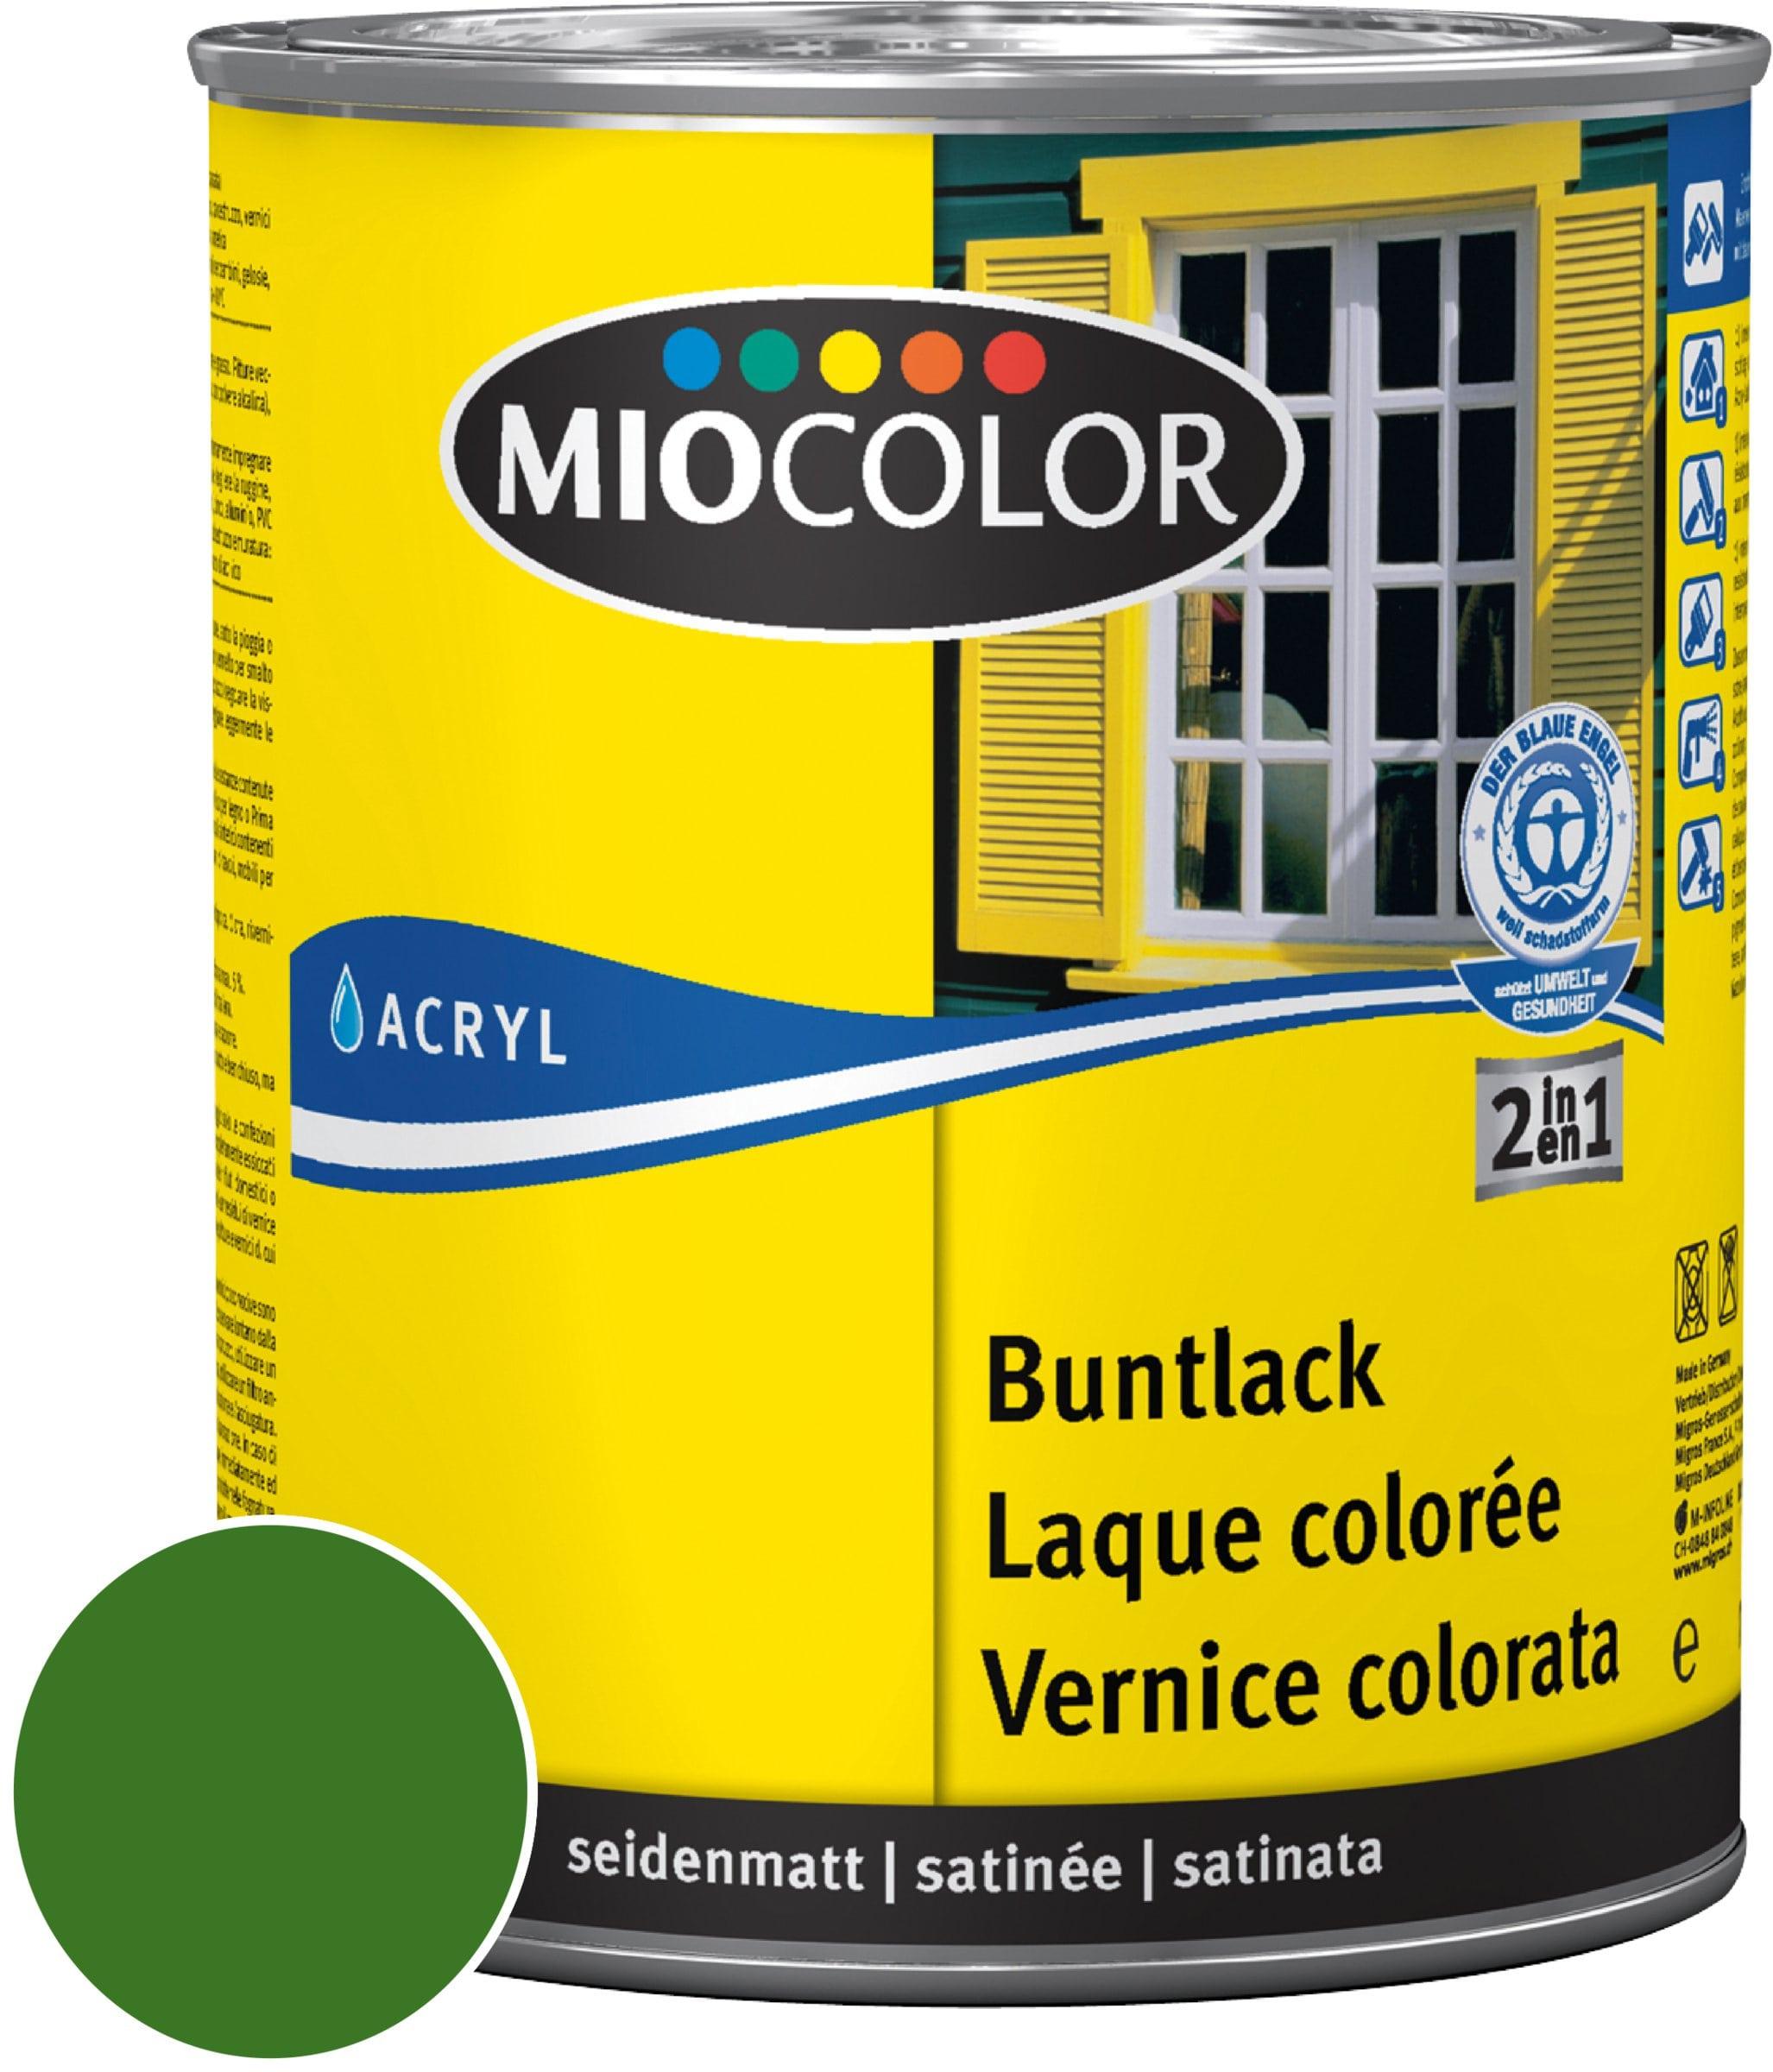 Miocolor Acryl Vernice colorata satinata Verde foglio 125 ml